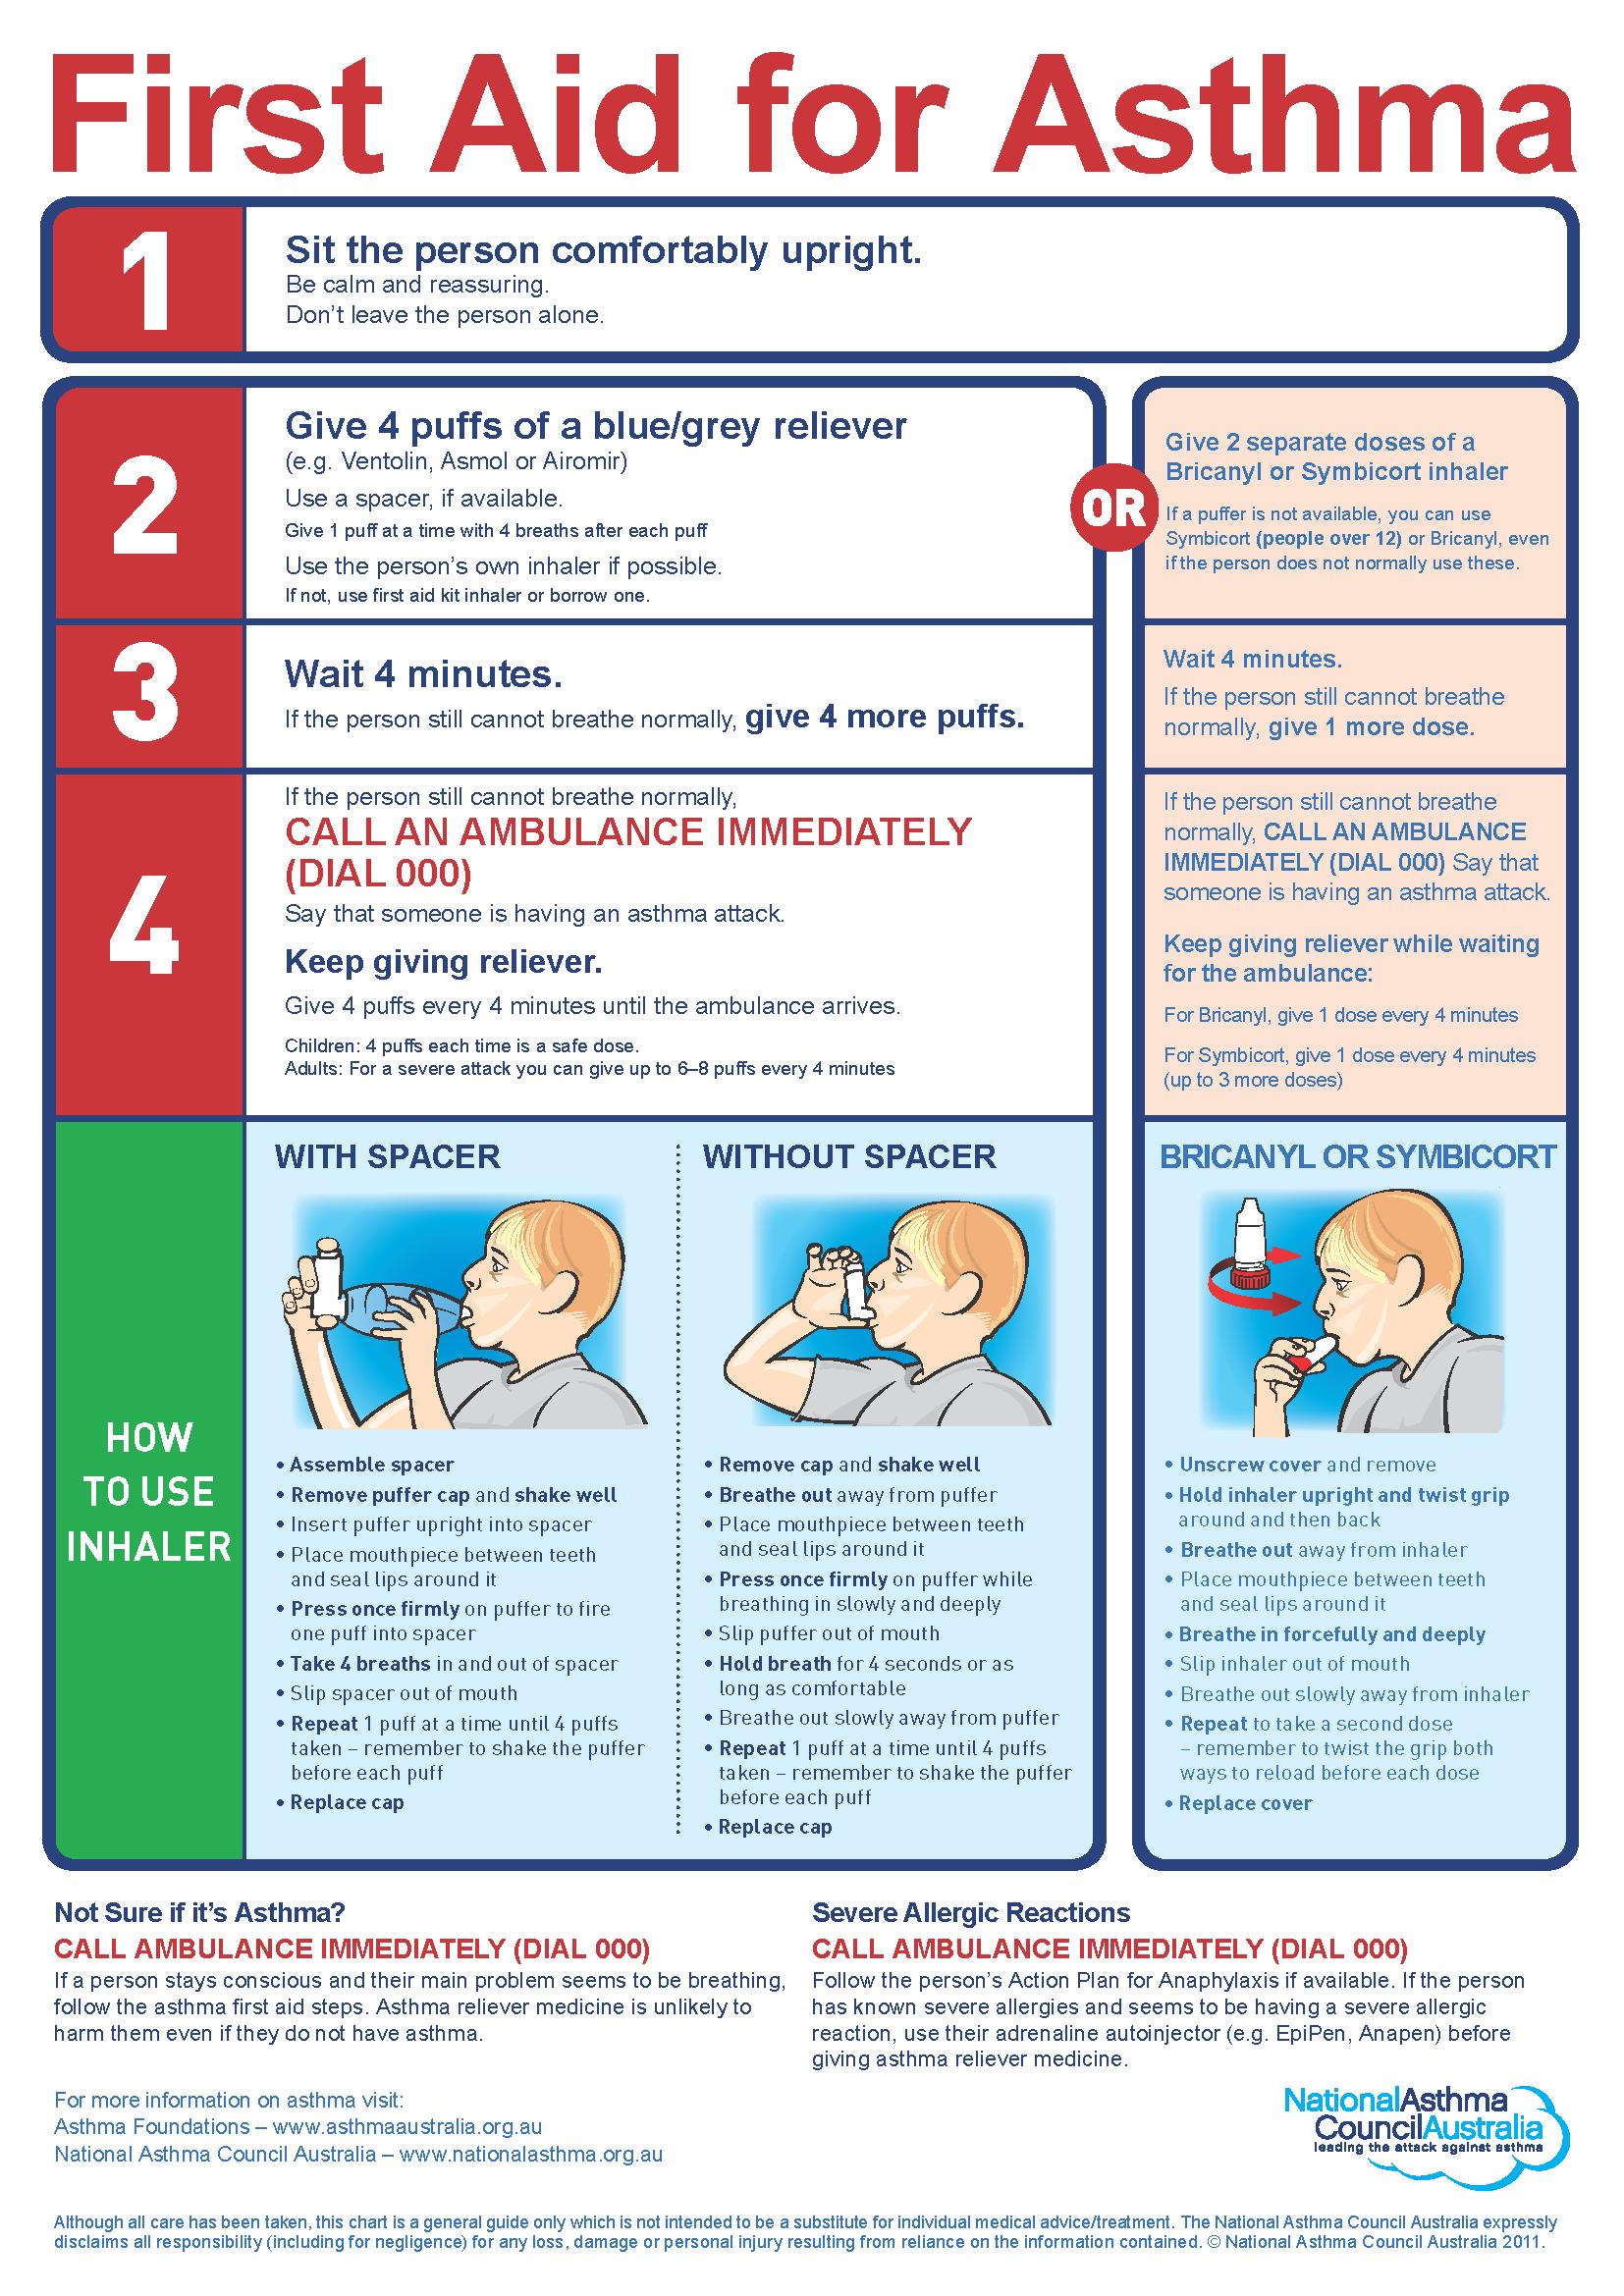 Asthma First Aid National Asthma Council Australia